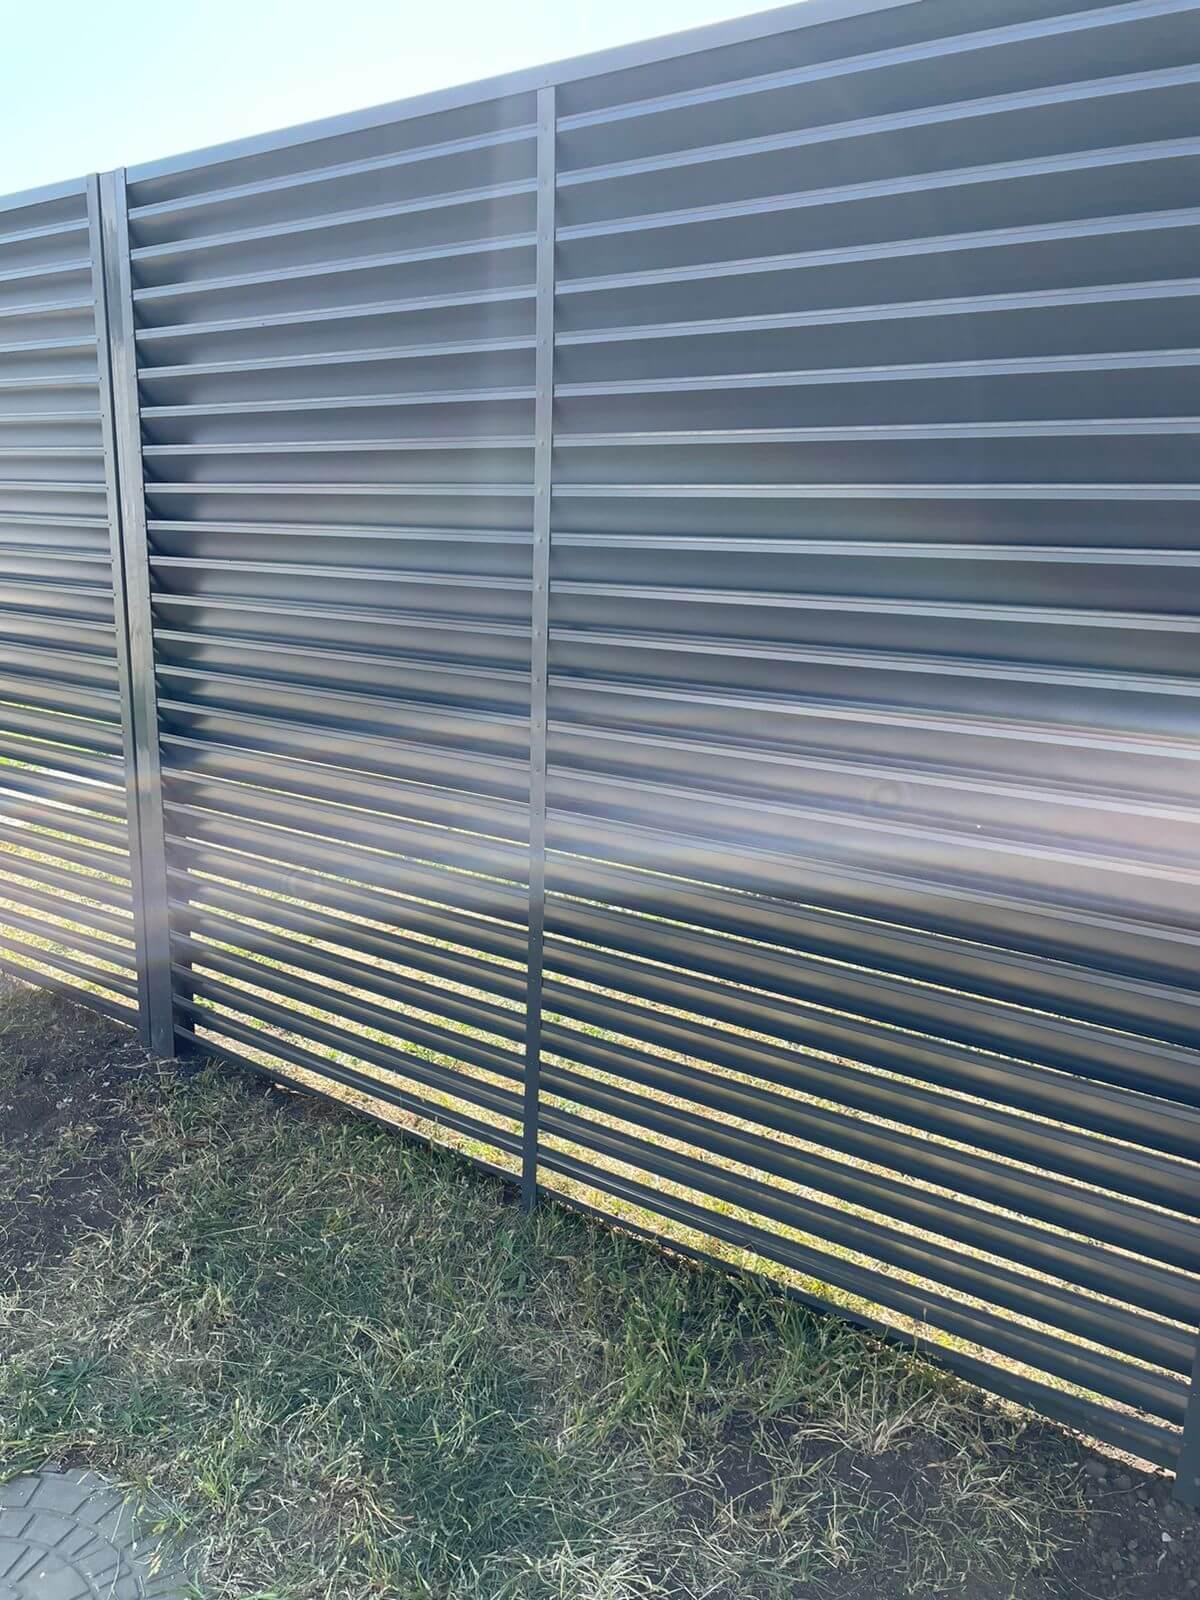 забор-жалюзи с ламелями эко-z ral7024/7024 серый графит двухсторонний фото2